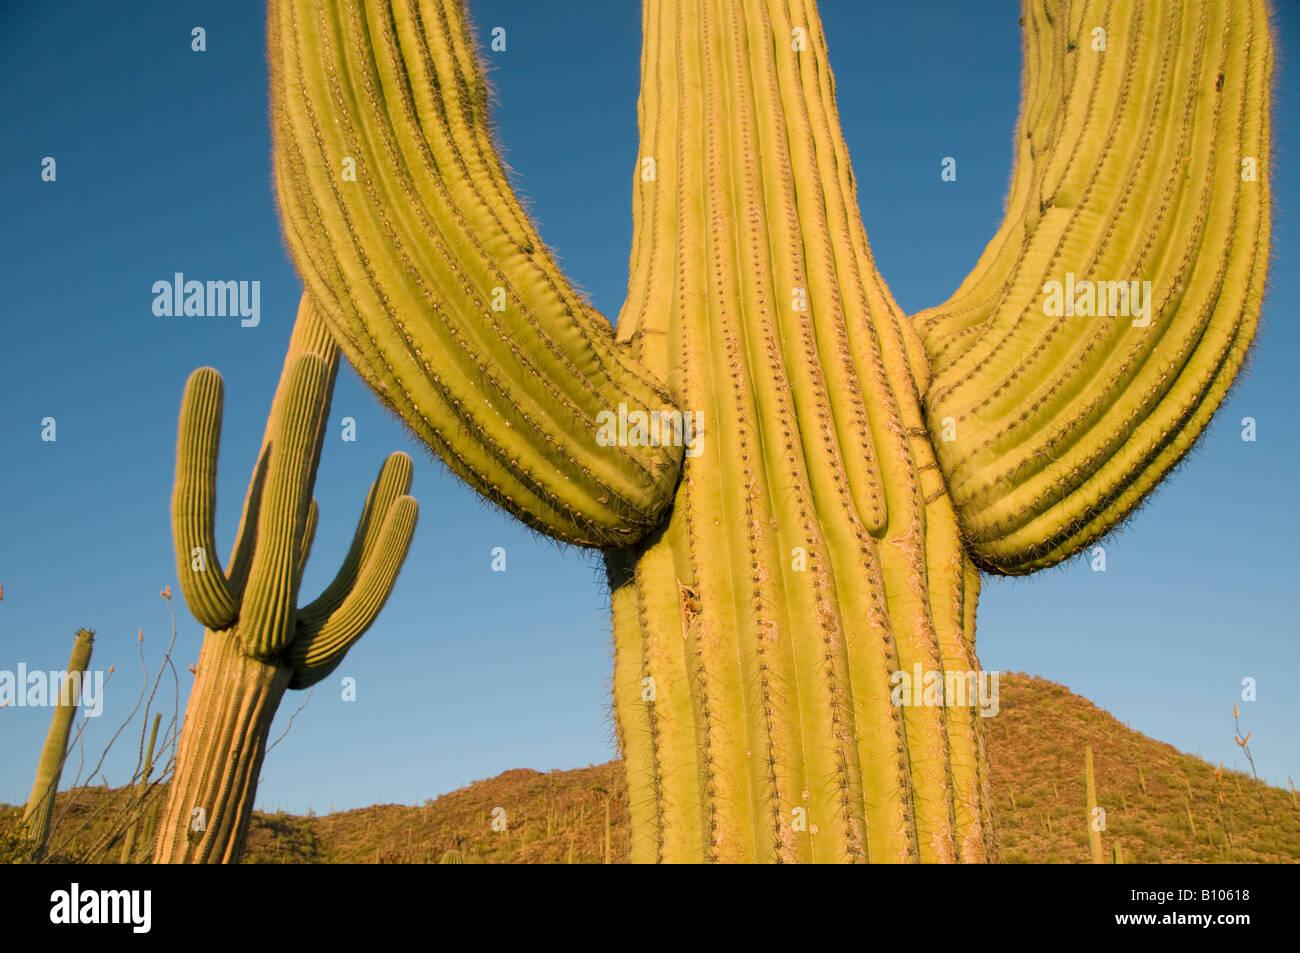 Saguaro-Kaktus (Carnegiea Gigantea) bei Sonnenuntergang, Saguaro National Park, Tucson, Arizona Area, USA Stockbild